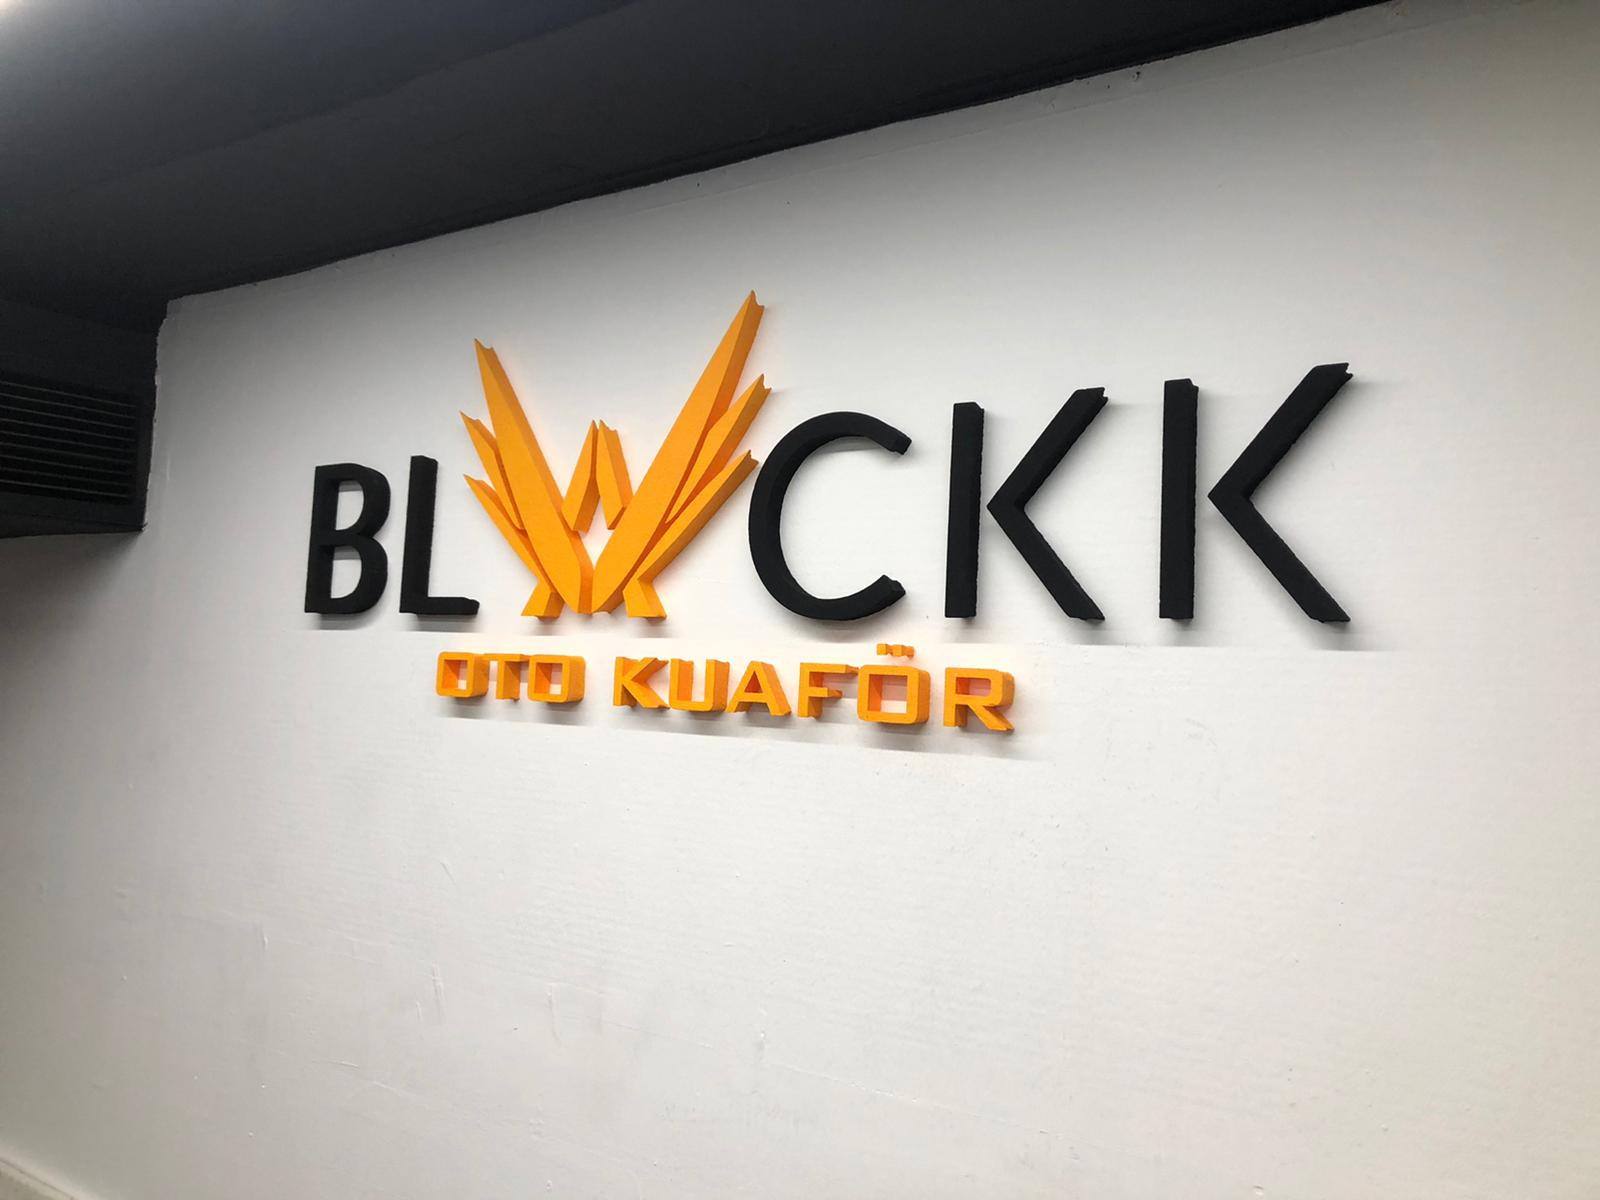 Blackk oto küaför logo tabela